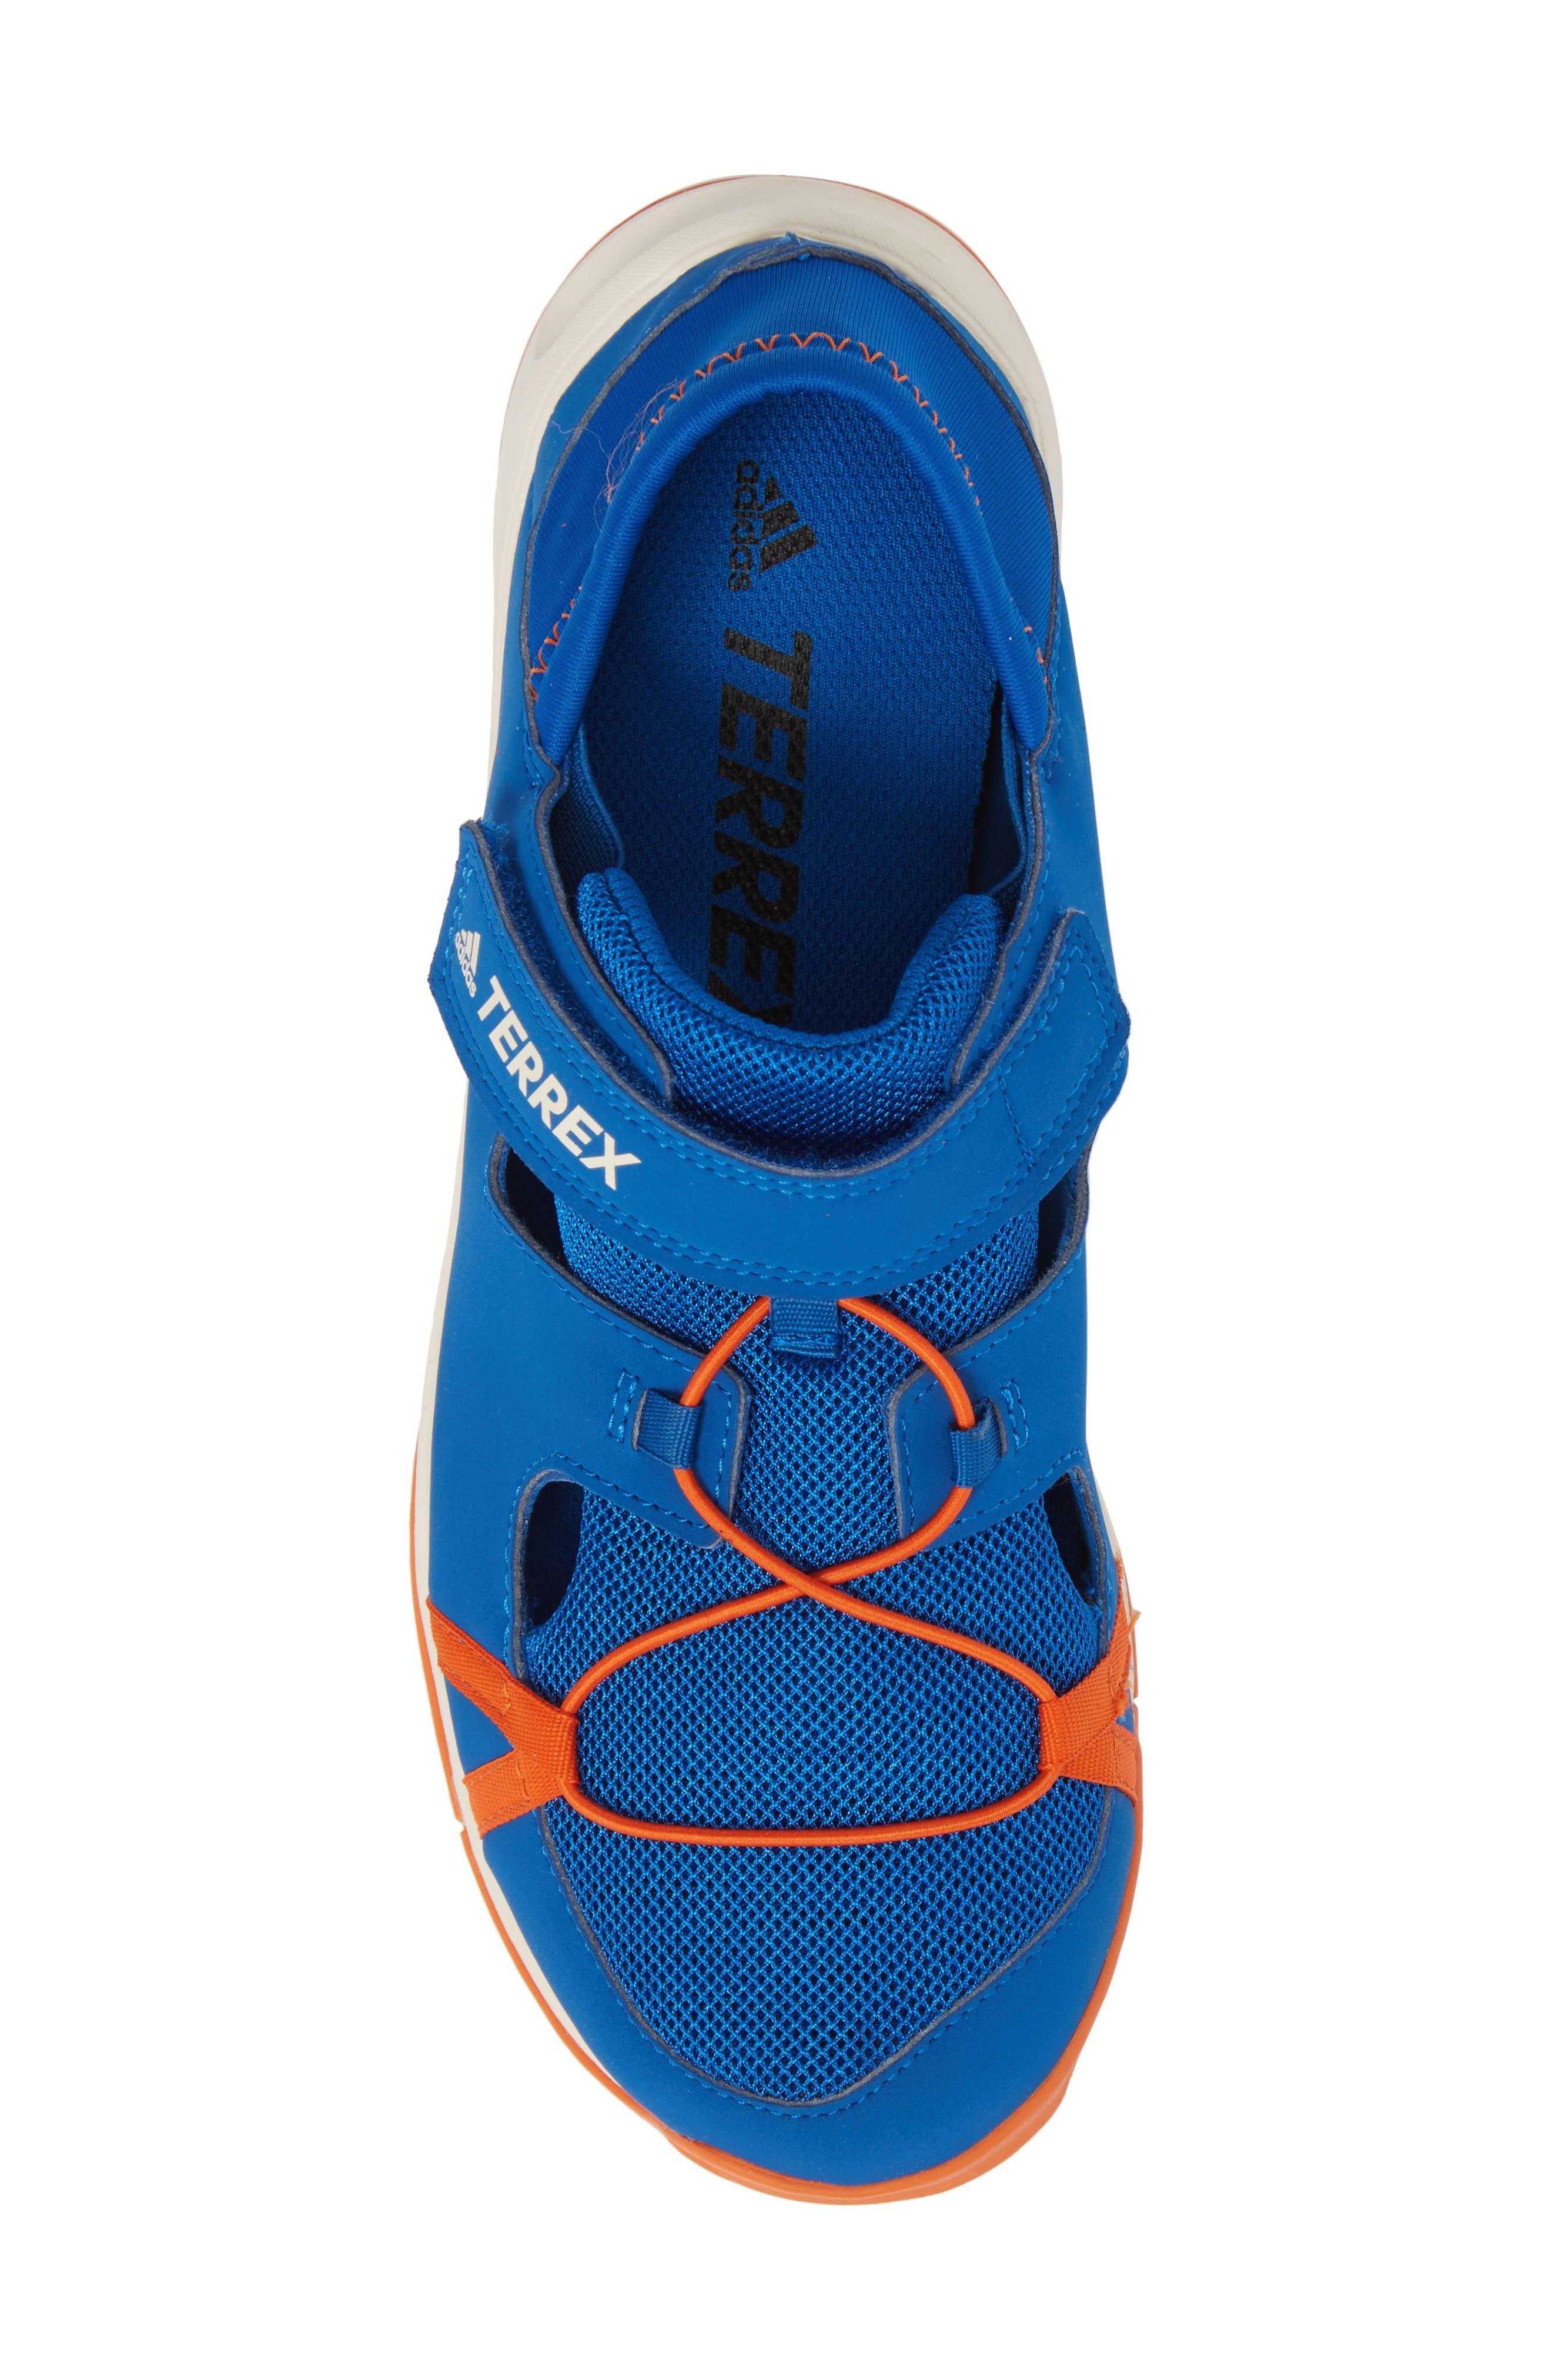 Terrex Tivid Sneaker,                             Alternate thumbnail 5, color,                             BLUE/ ORANGE/ CHALK WHITE